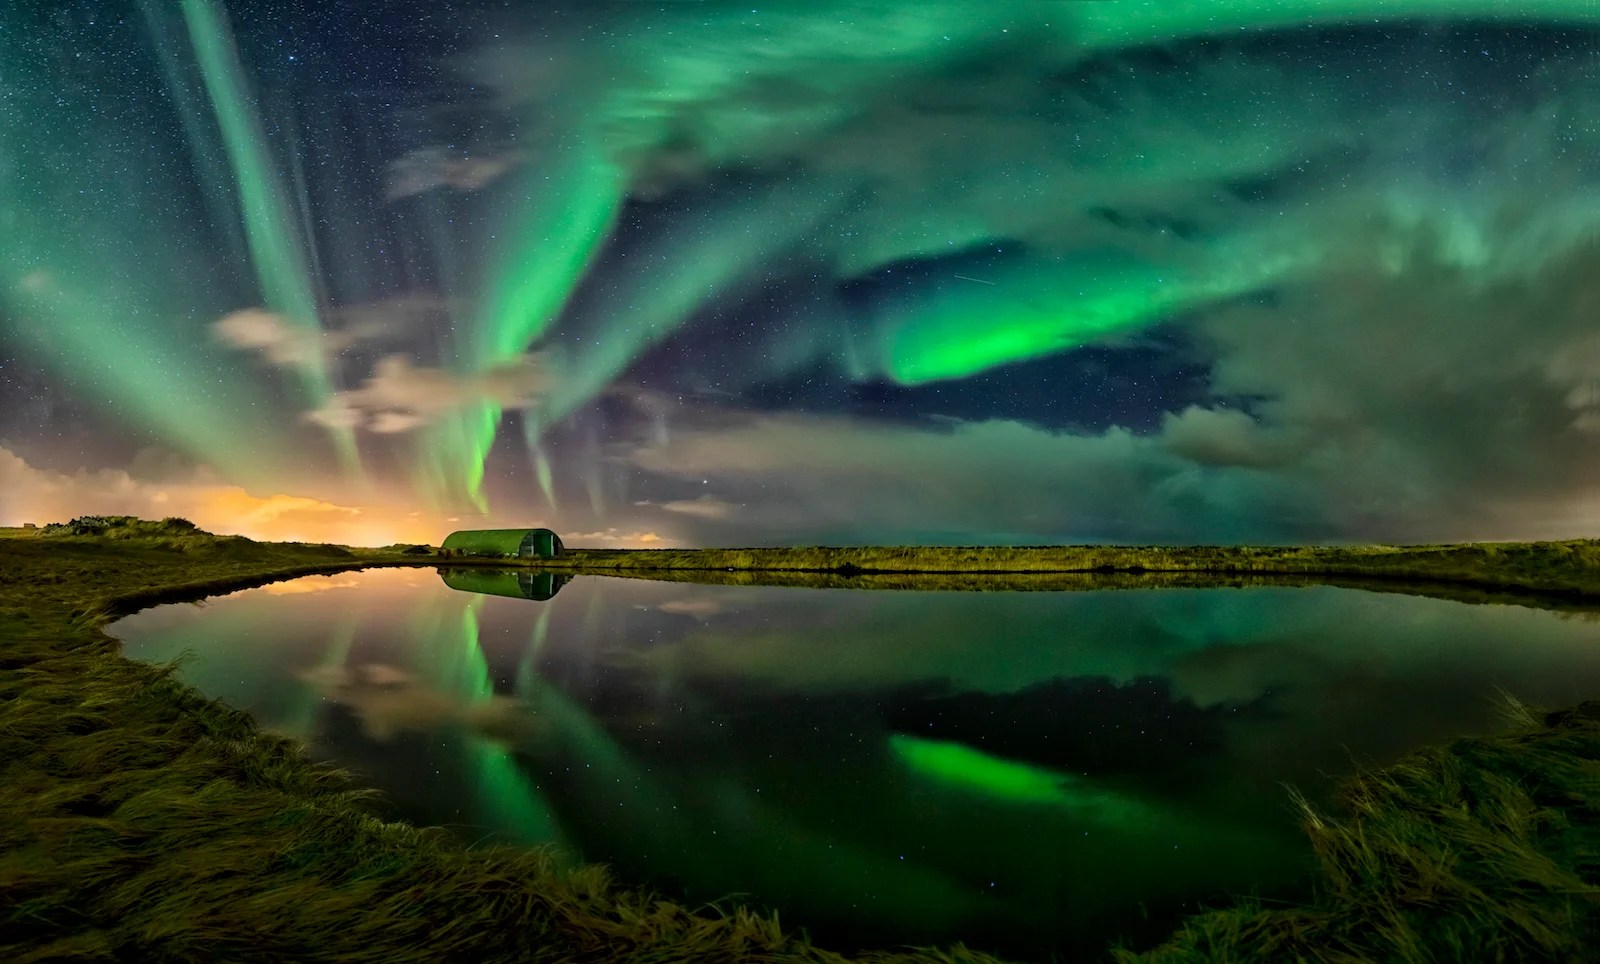 Deal alert: Visit Alaska to see the northern lights for up to 35% off